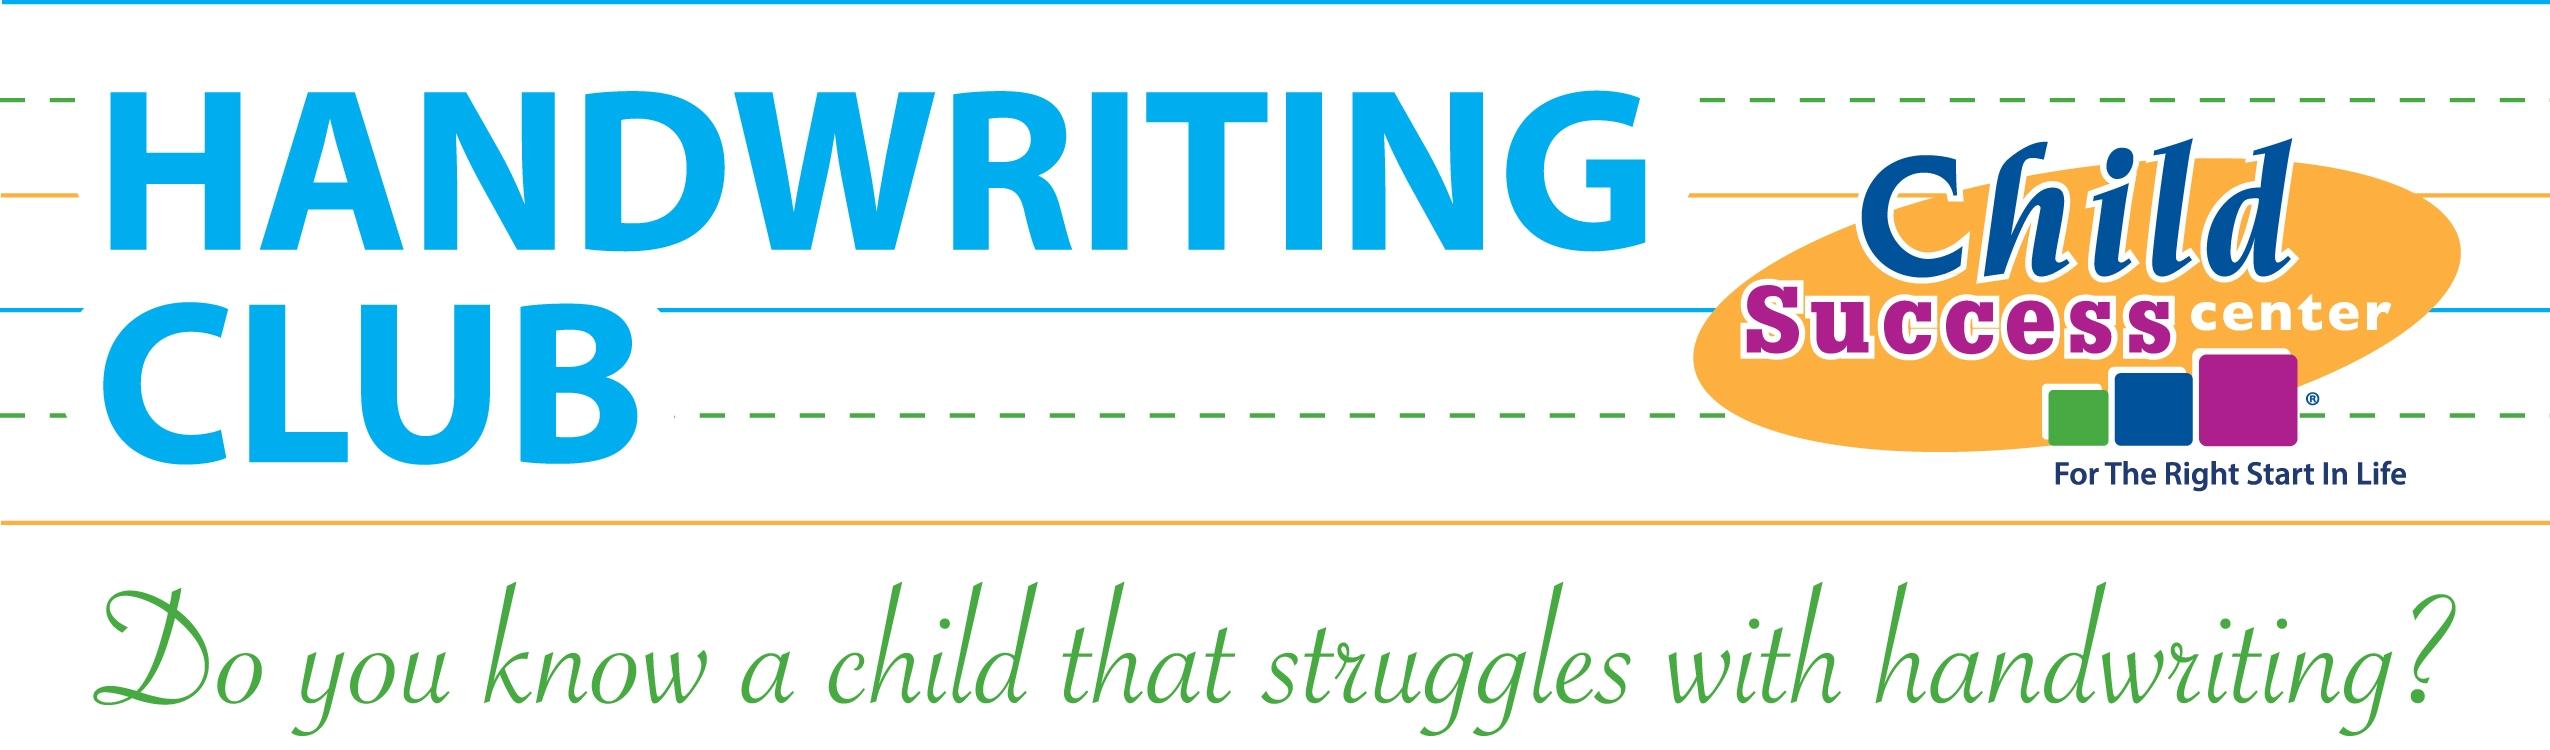 Child Success Center Handwriting Club